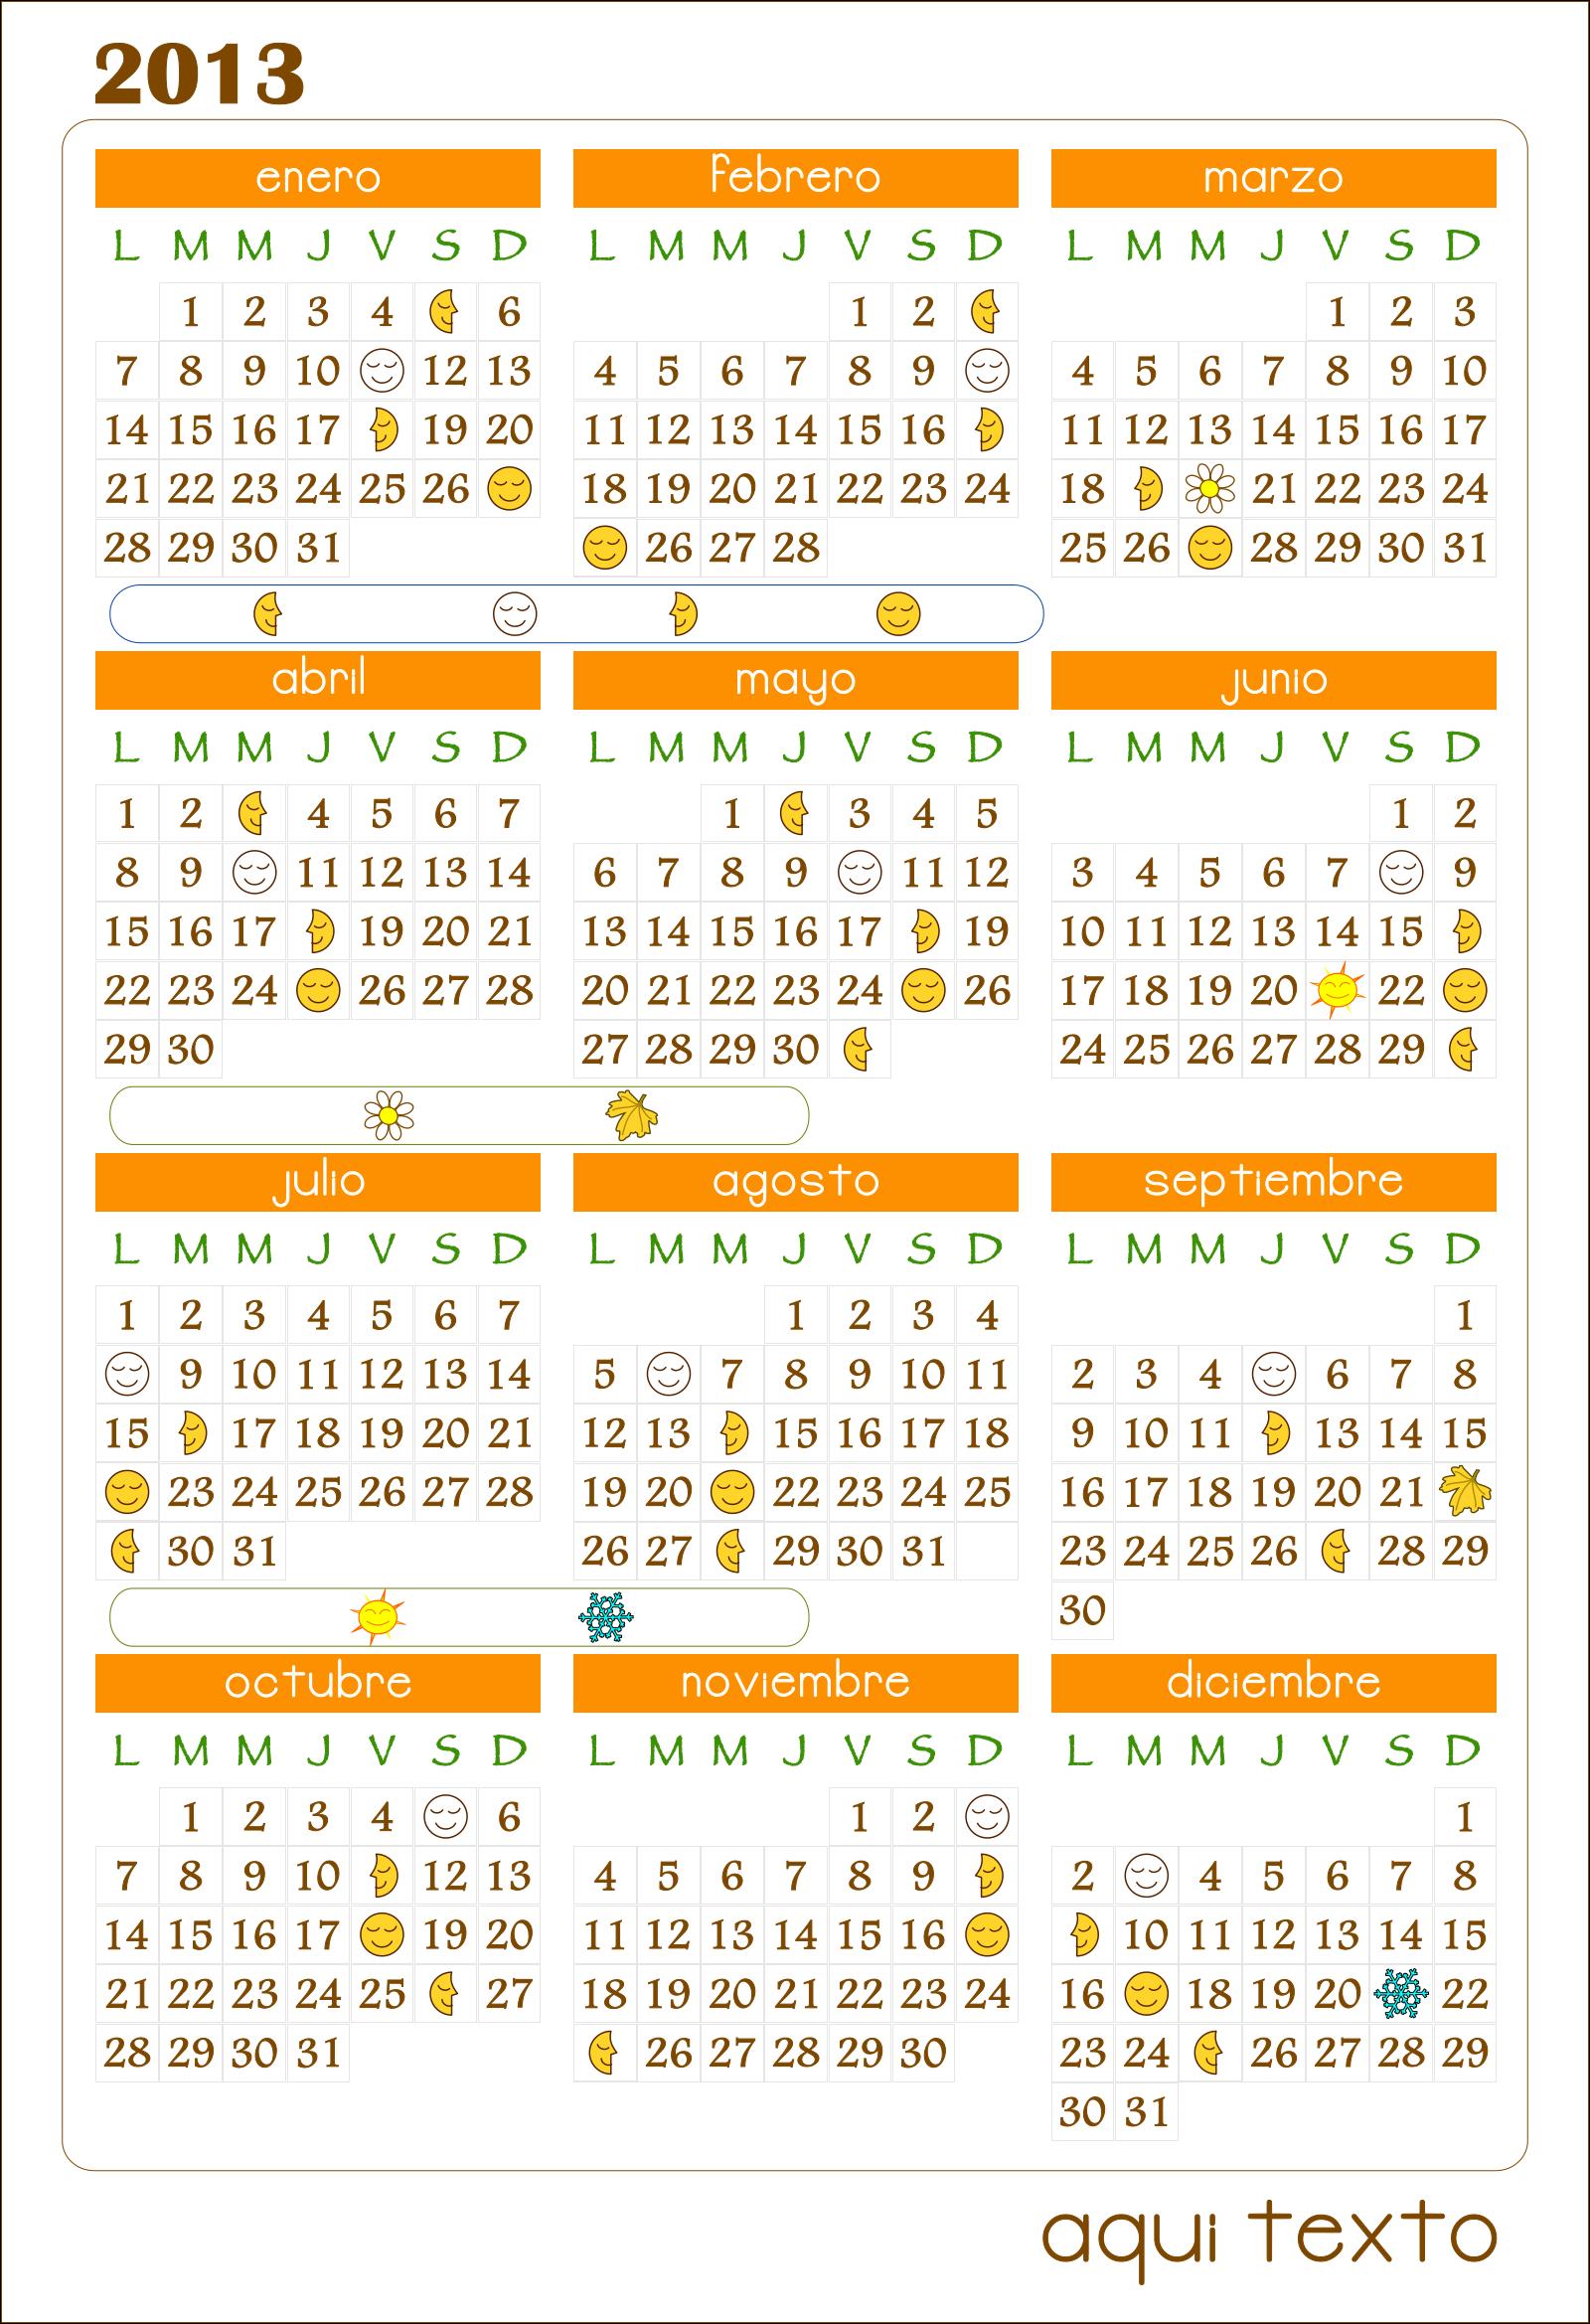 Calendario Clipart.Calendario Png Svg Clip Art For Web Download Clip Art